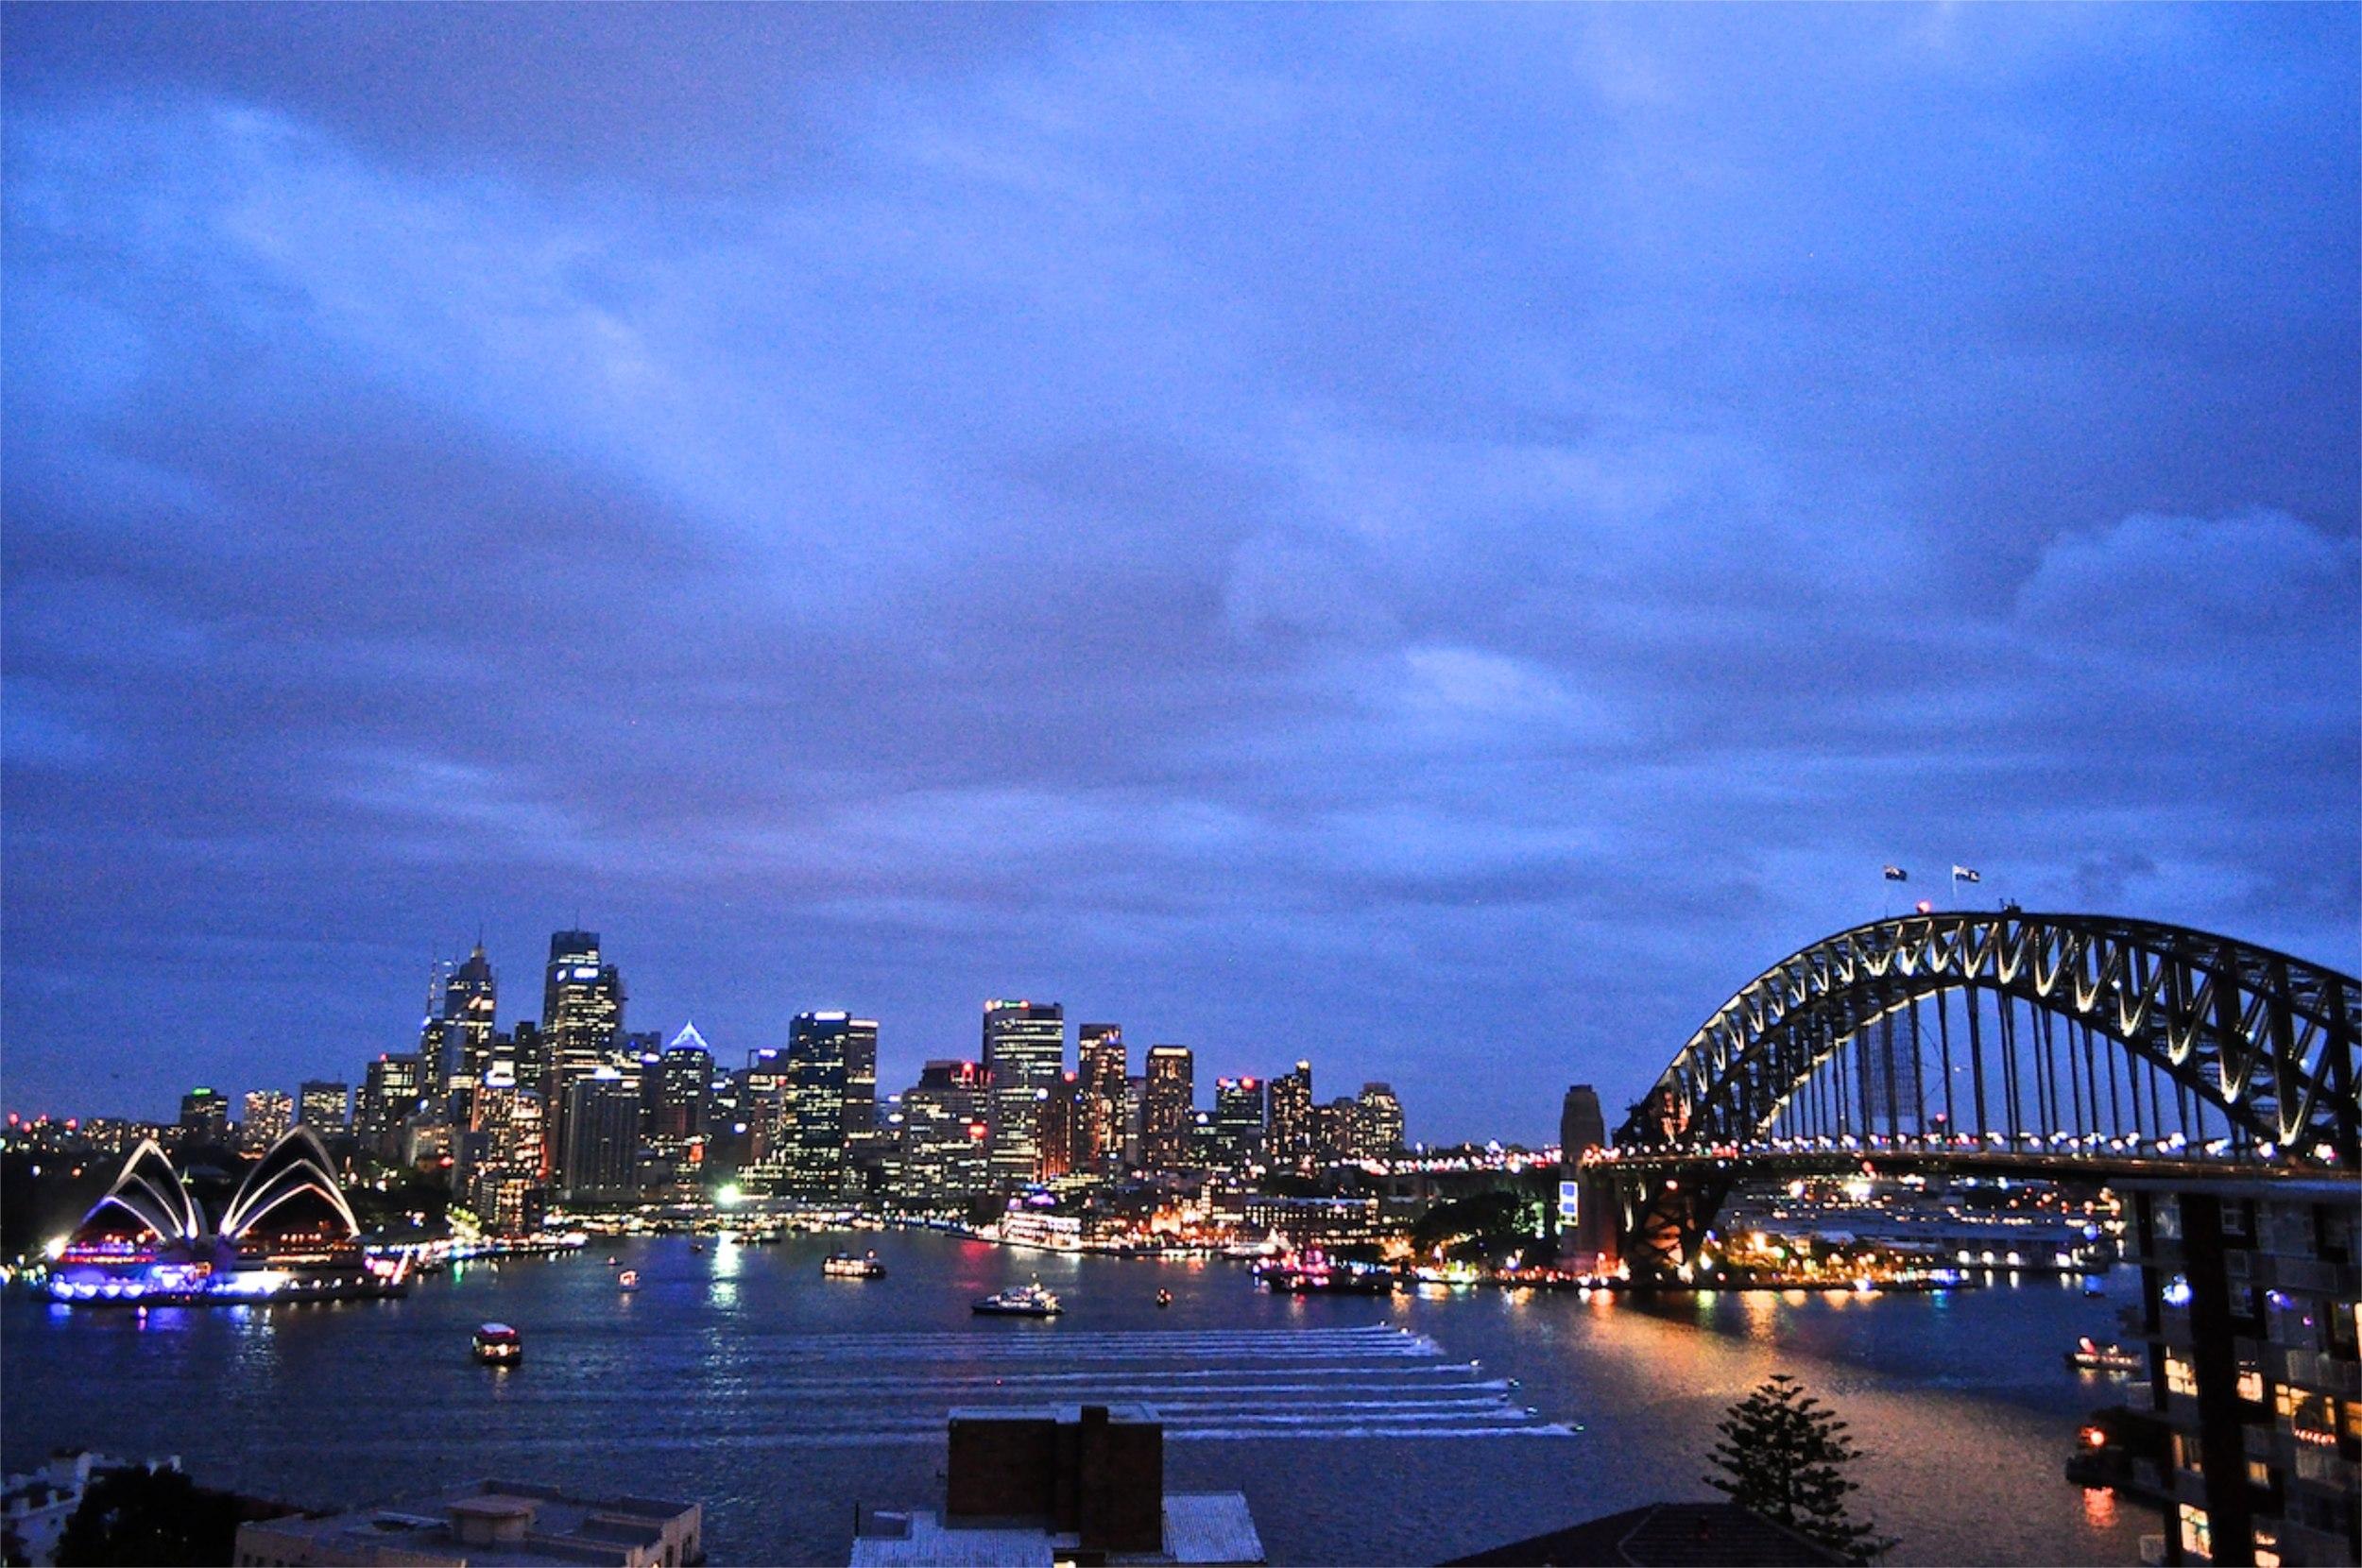 Twilight. New Year's Eve. Sydney. Australia.